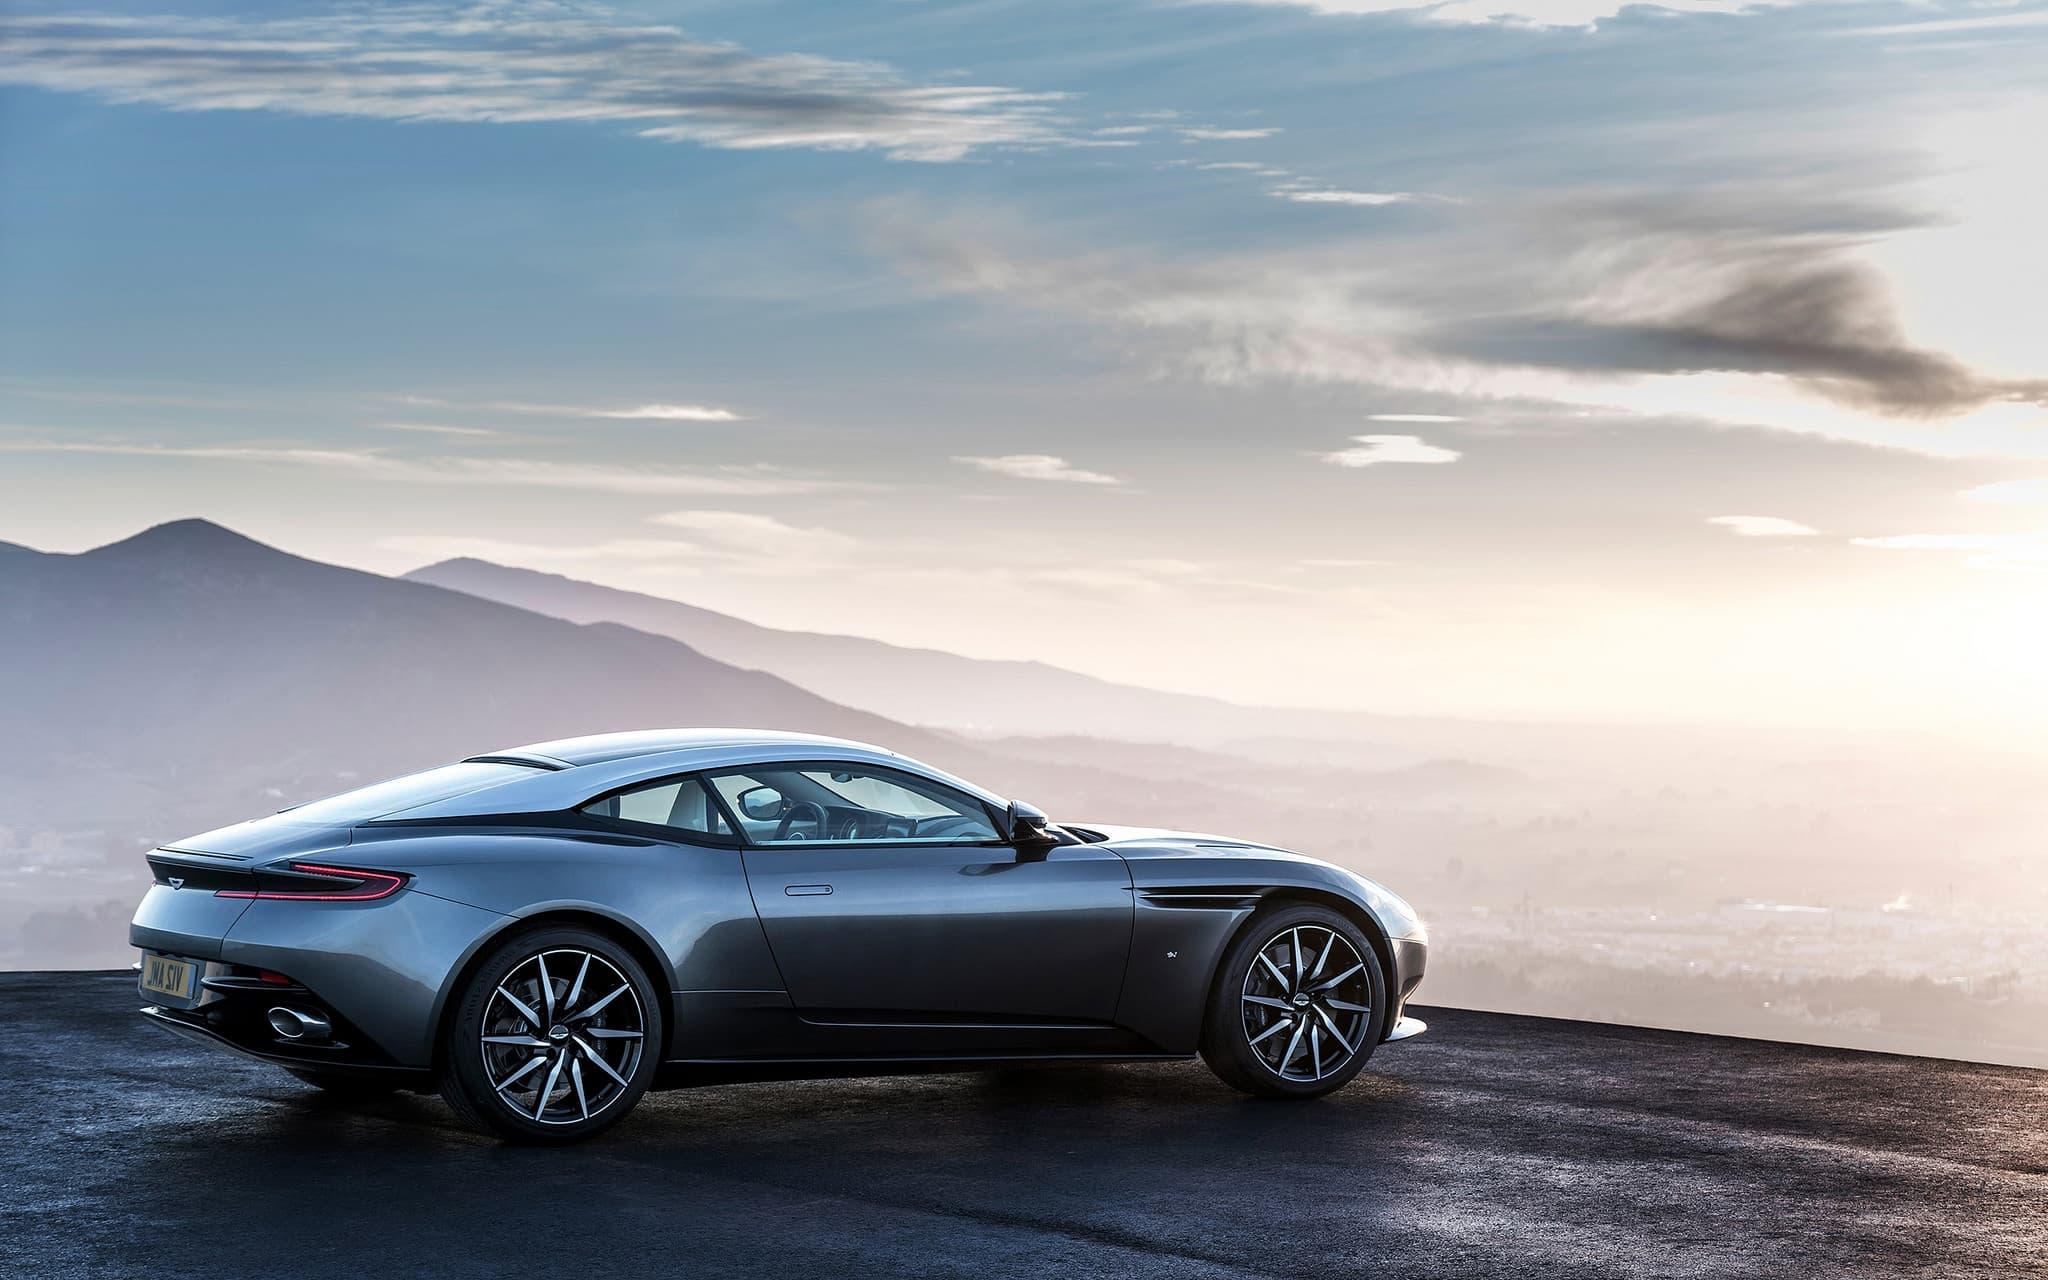 Aston Martin Db11 Wallpapers Top Free Aston Martin Db11 Backgrounds Wallpaperaccess